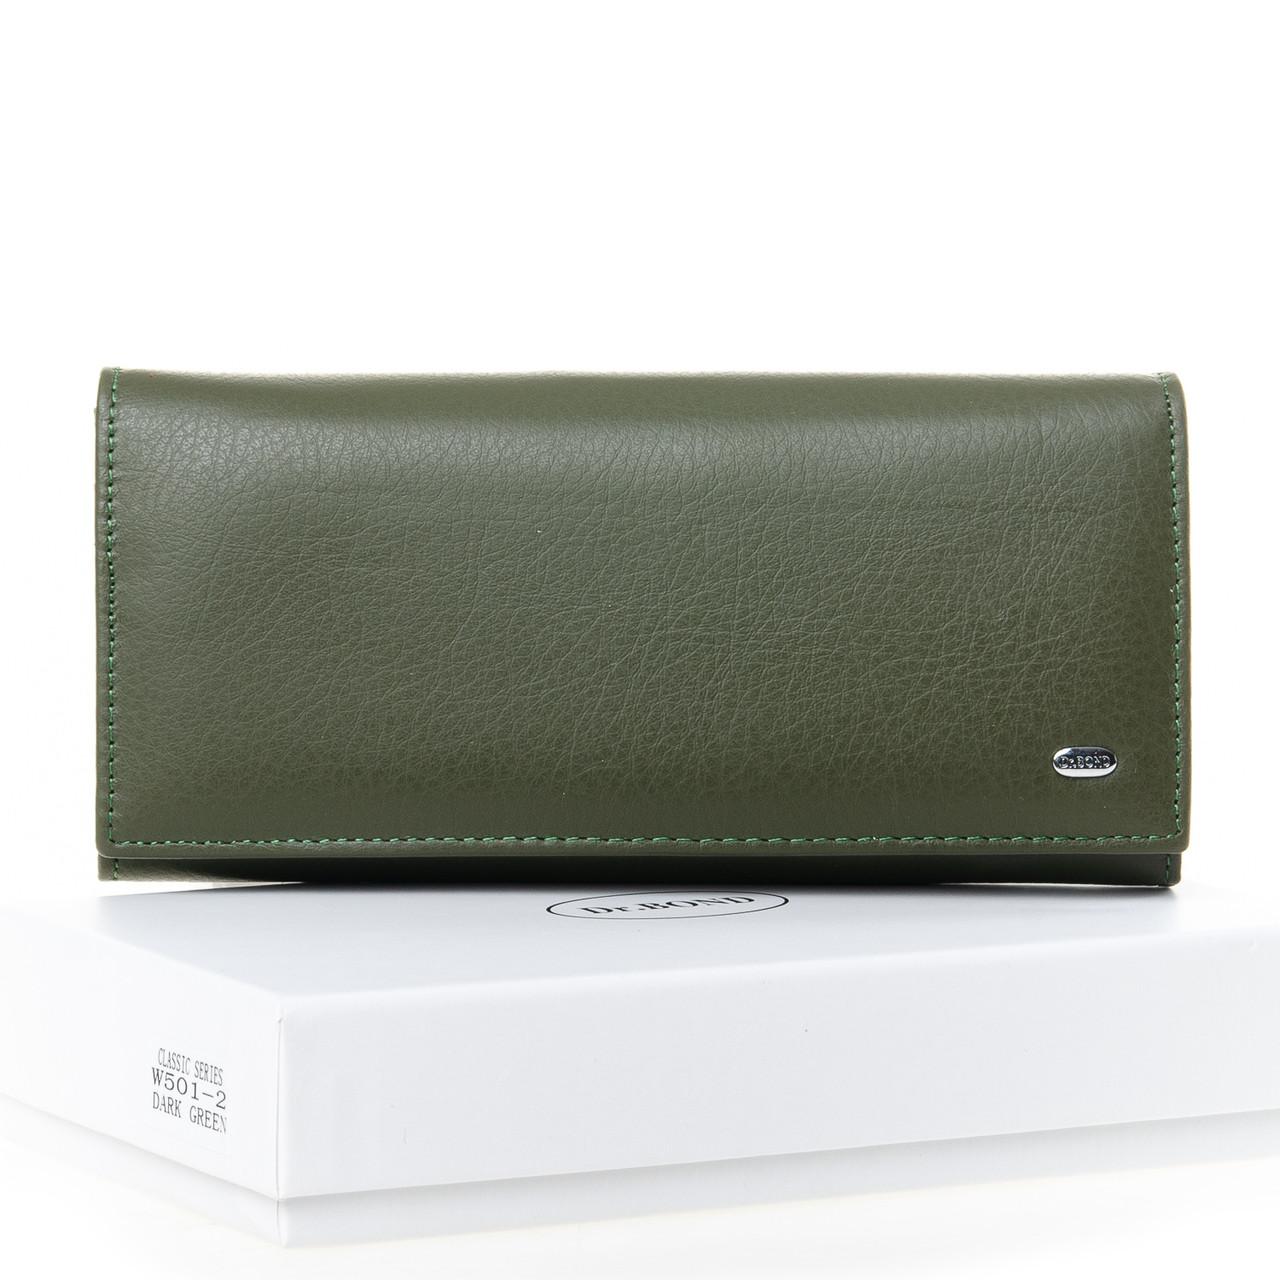 Кошелек Classic кожа DR. BOND 18,5*9*3,5 (W501-2 dark-green)